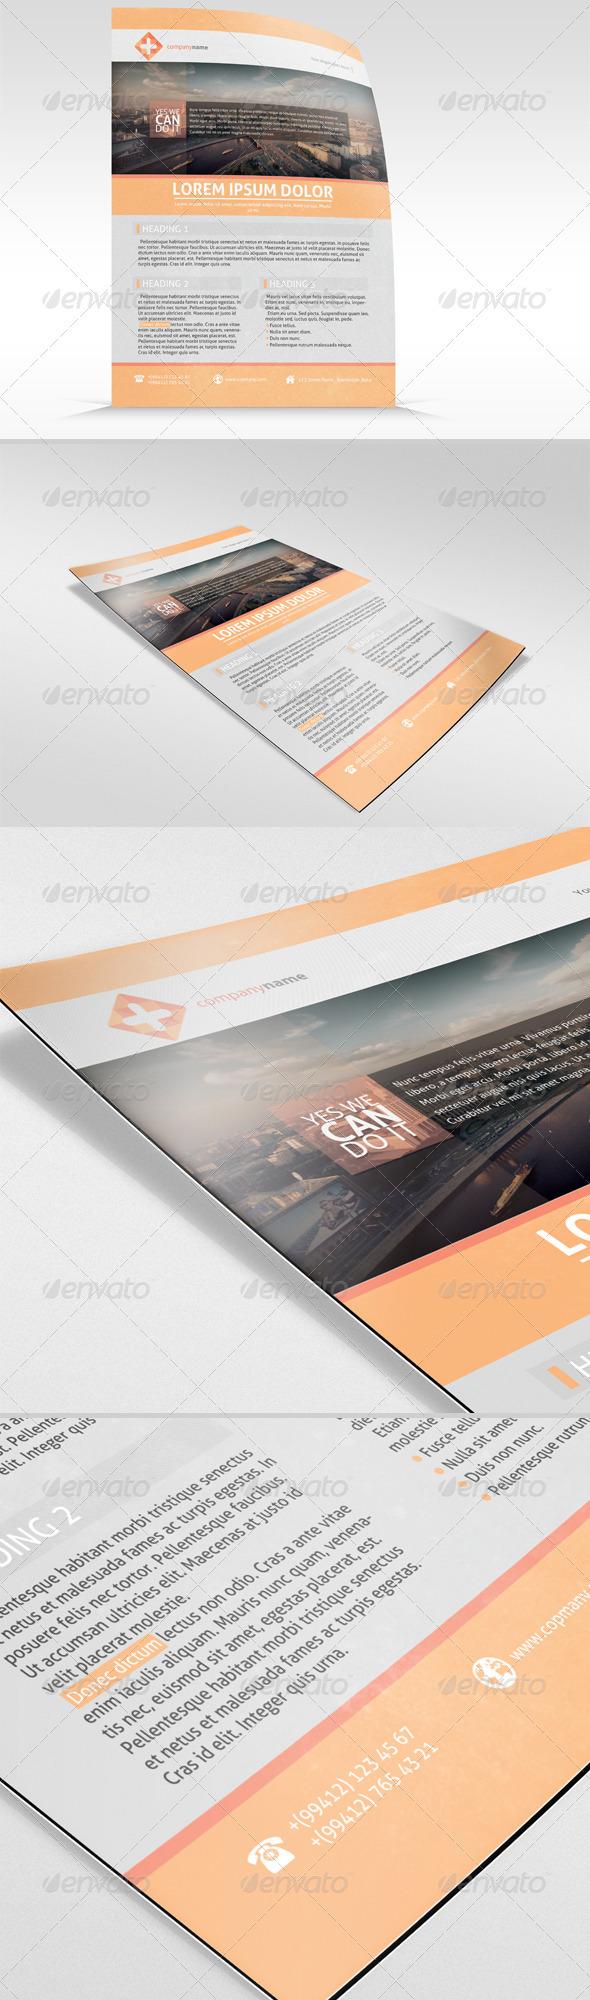 GraphicRiver Sleek Corporate Flyer 2505821